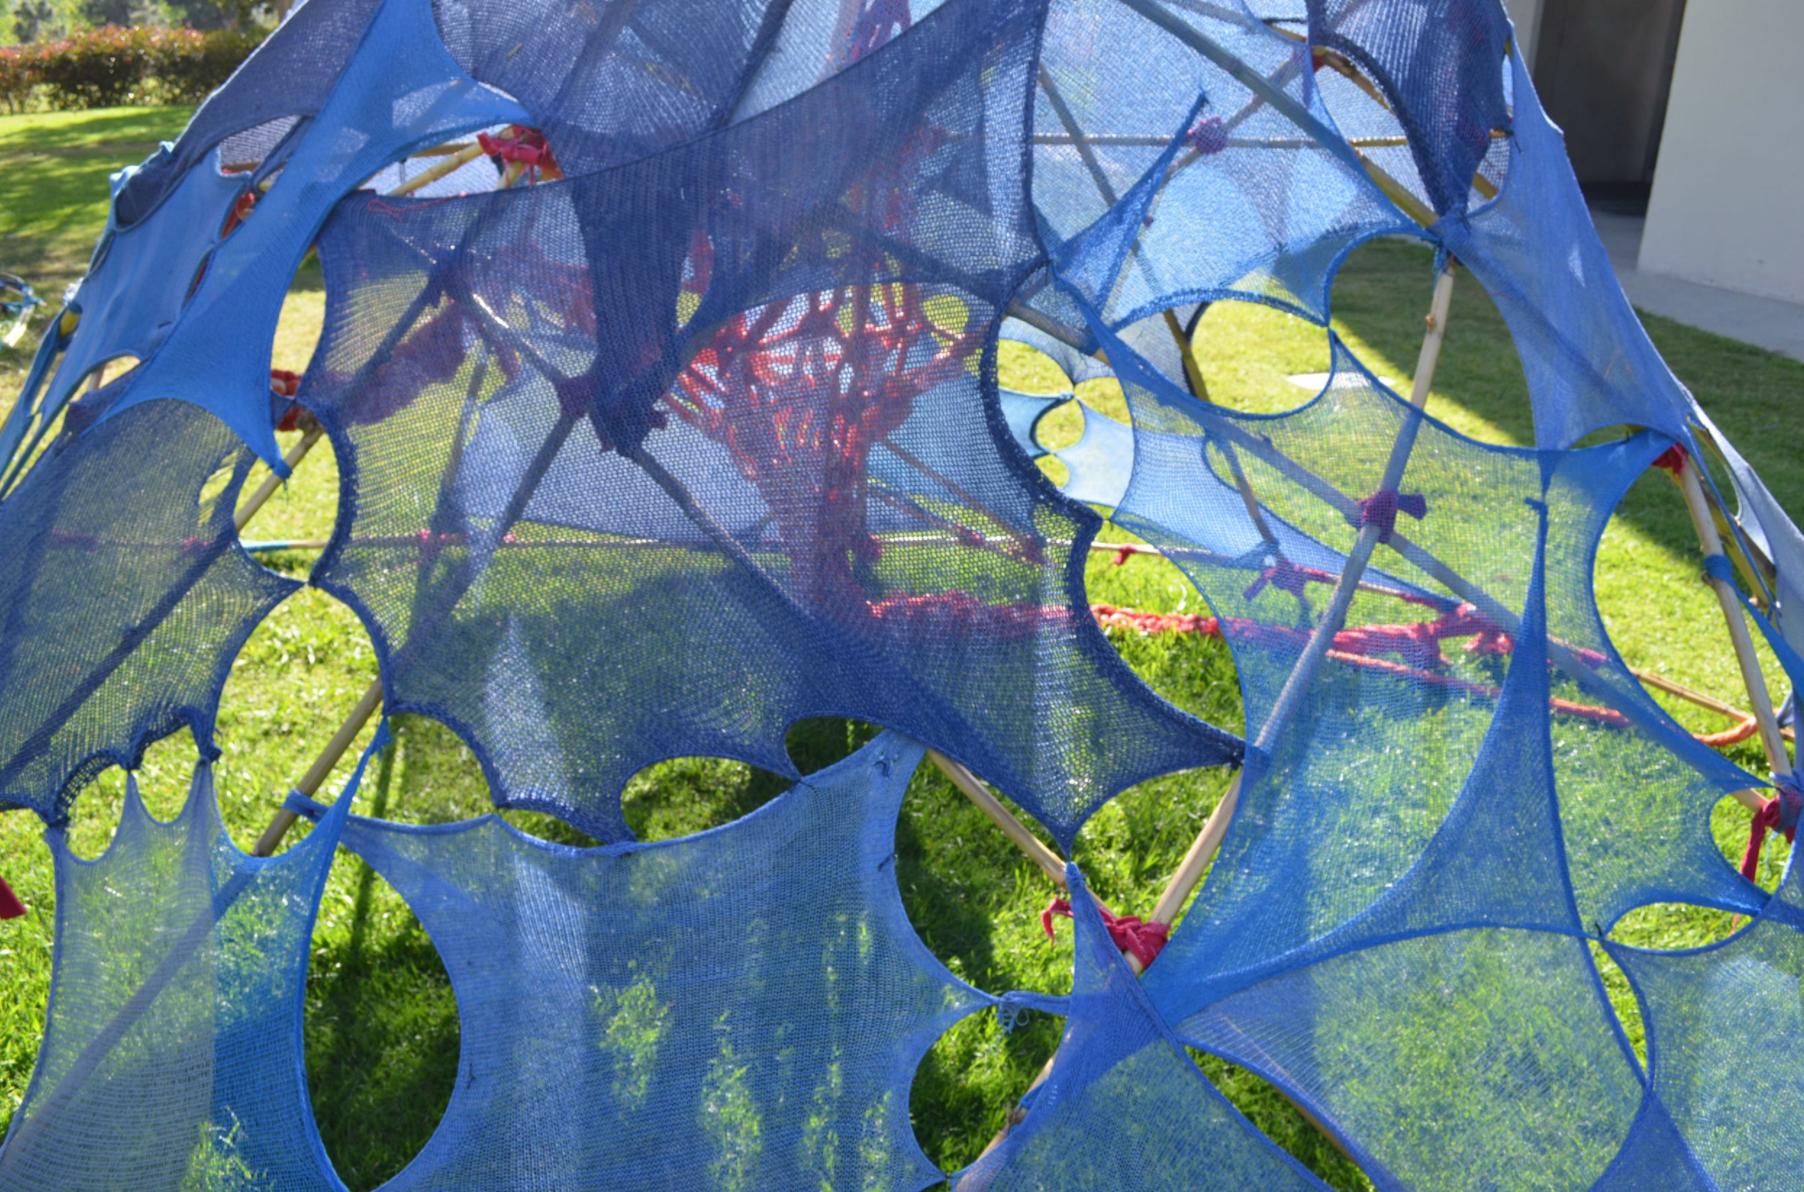 Jacqueline-Surdell-Artist-Installation-Tents-09.jpg